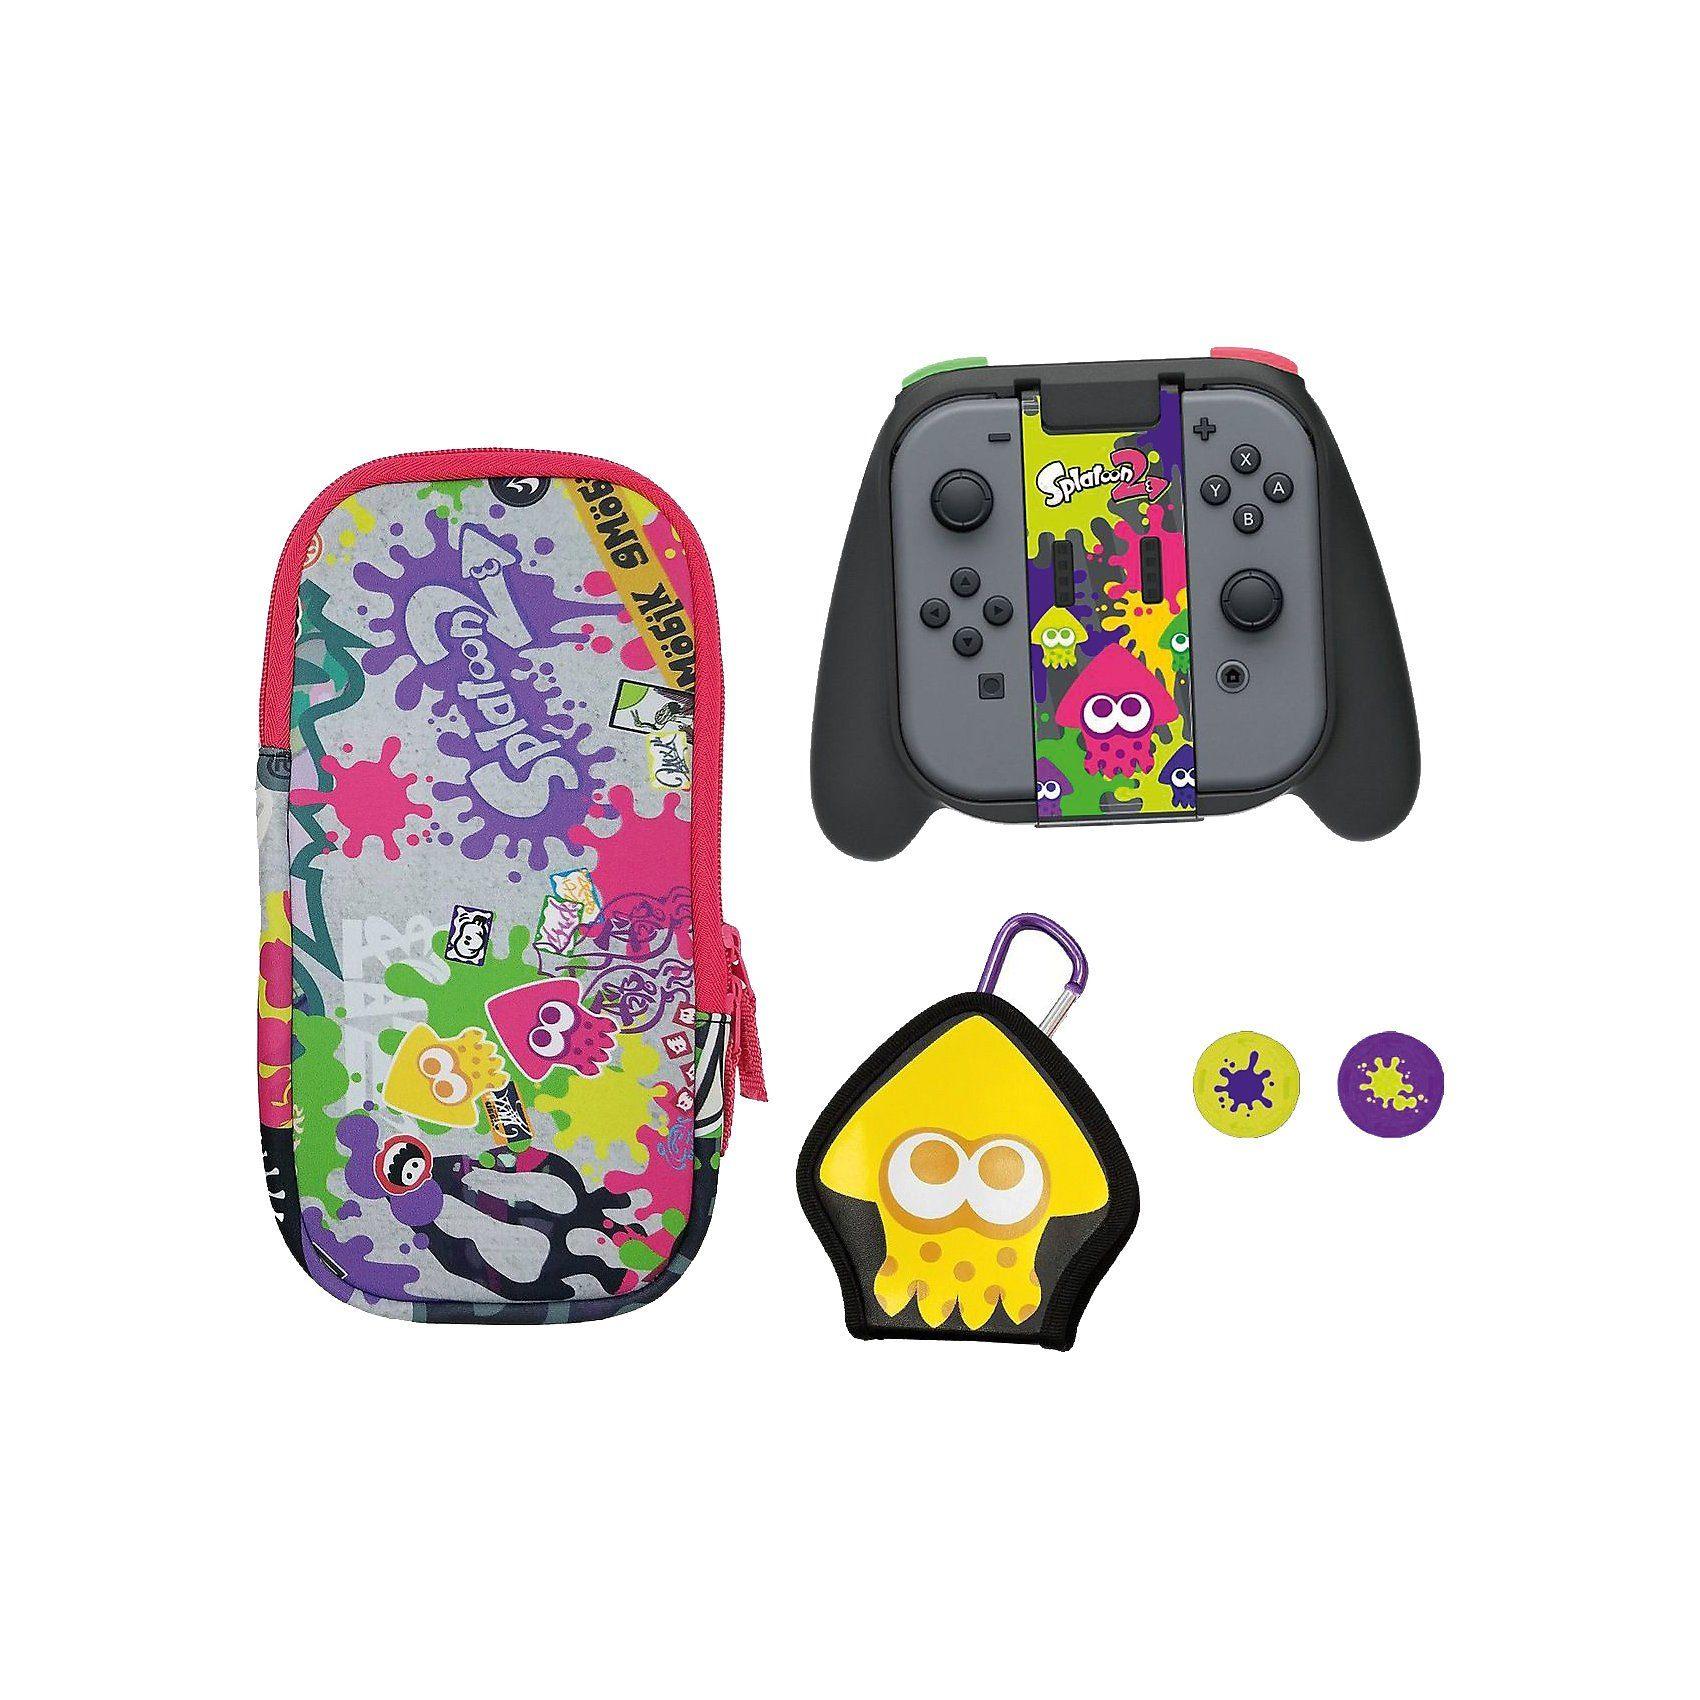 Nintendo Switch Splatoon 2 Splat Pack - Deluxe Zubehör Set